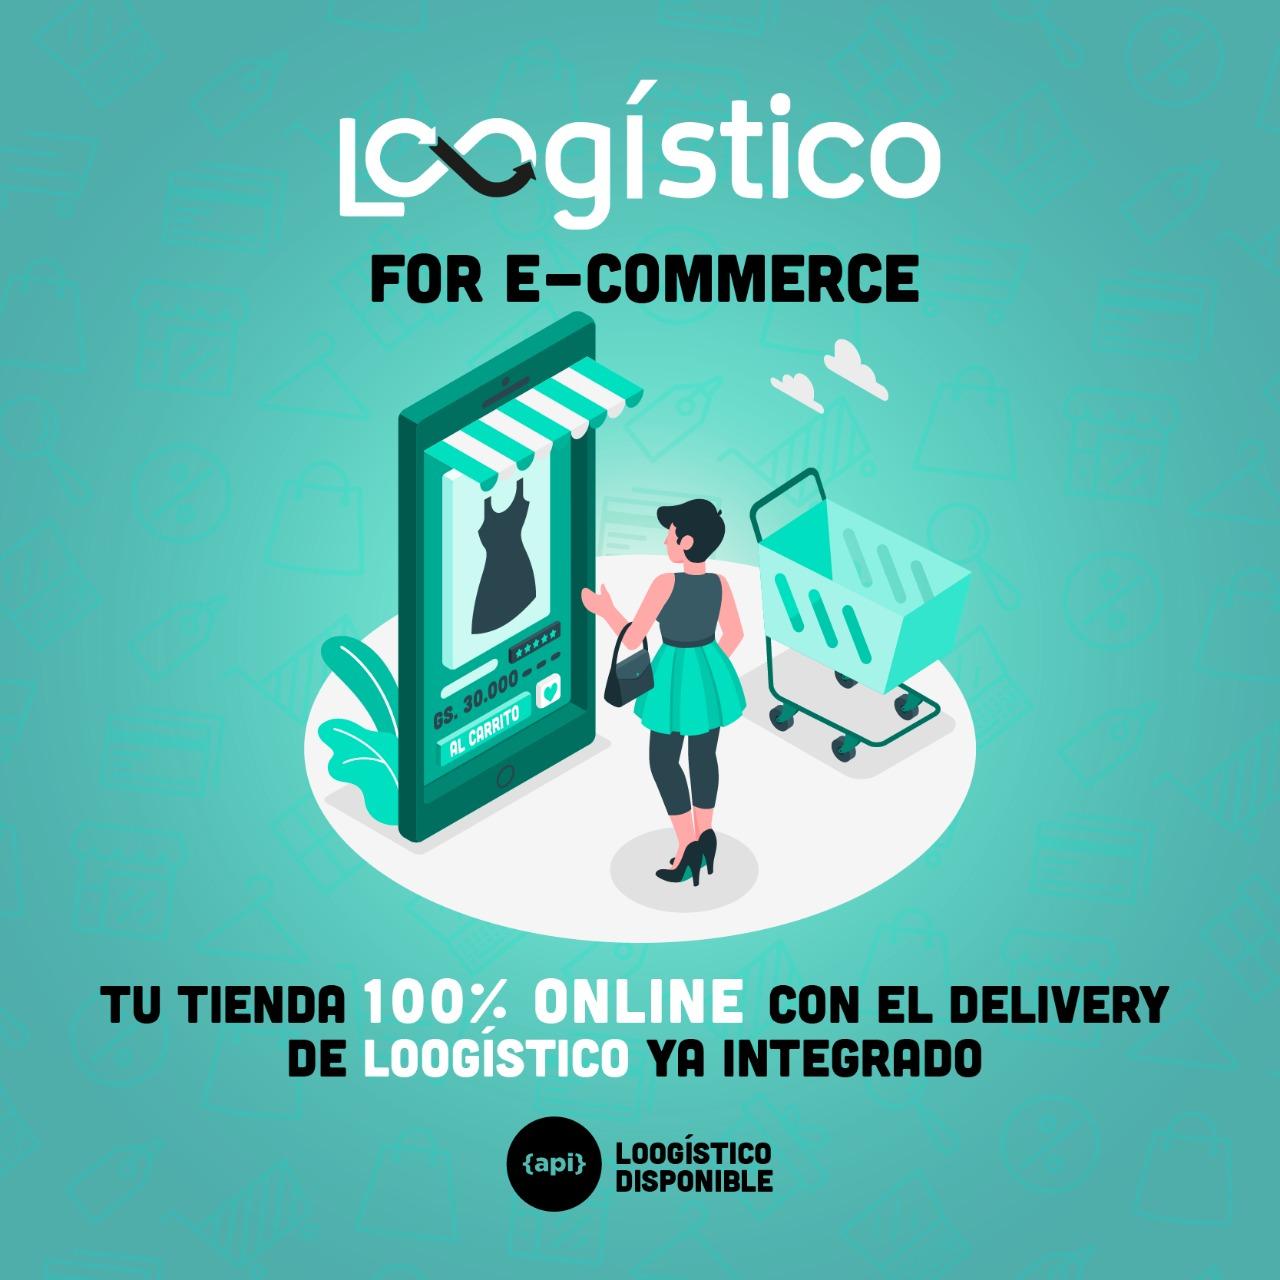 Loogistico for E-Commerce